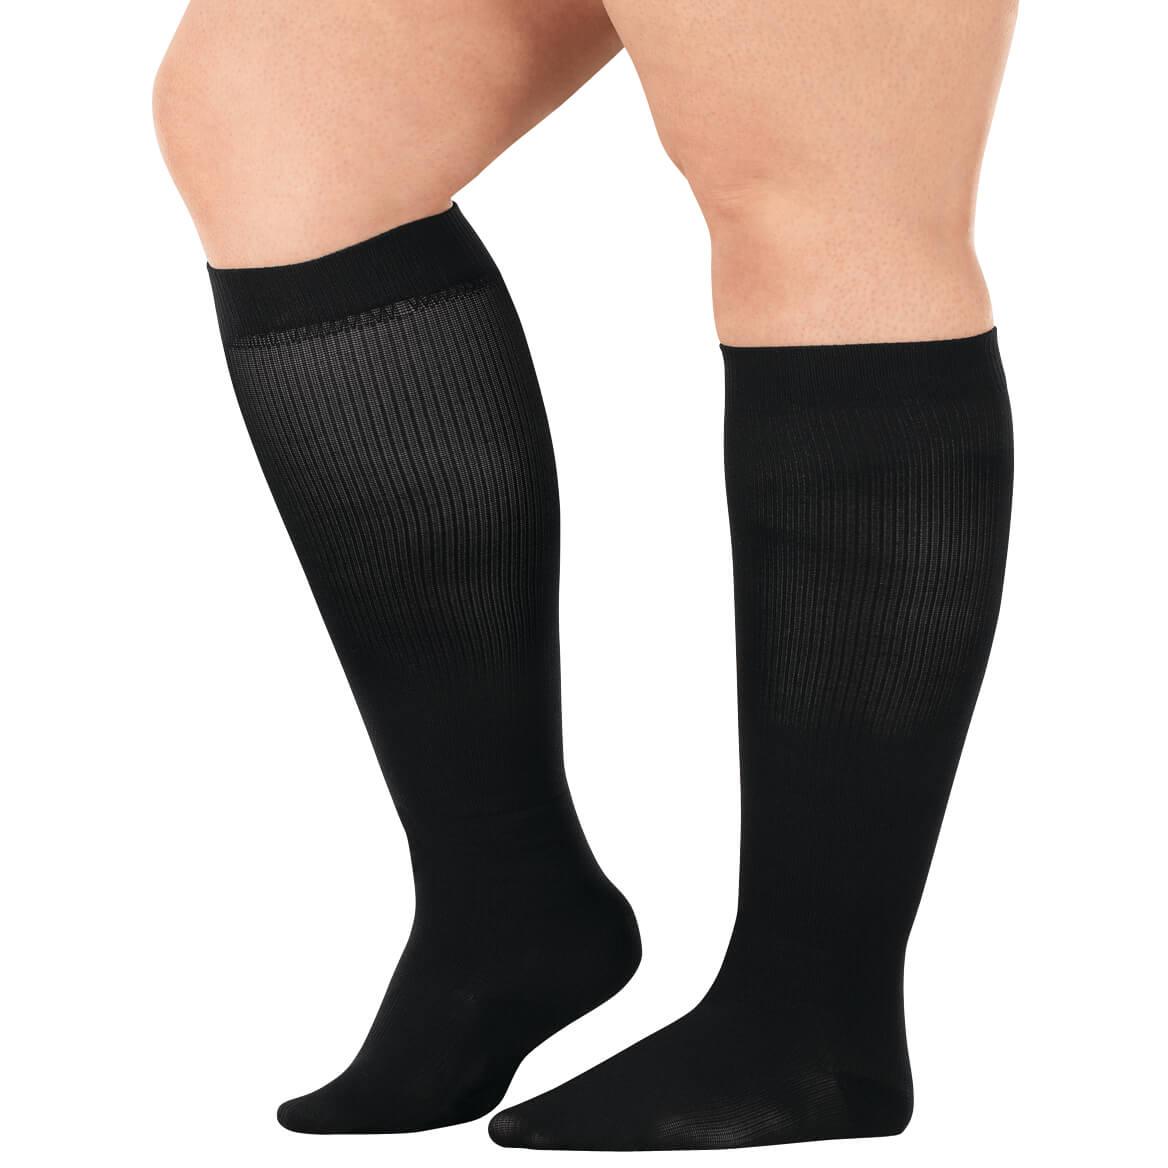 Healthy Steps™ Wide Calf Compression Socks, 15-20 mmHg